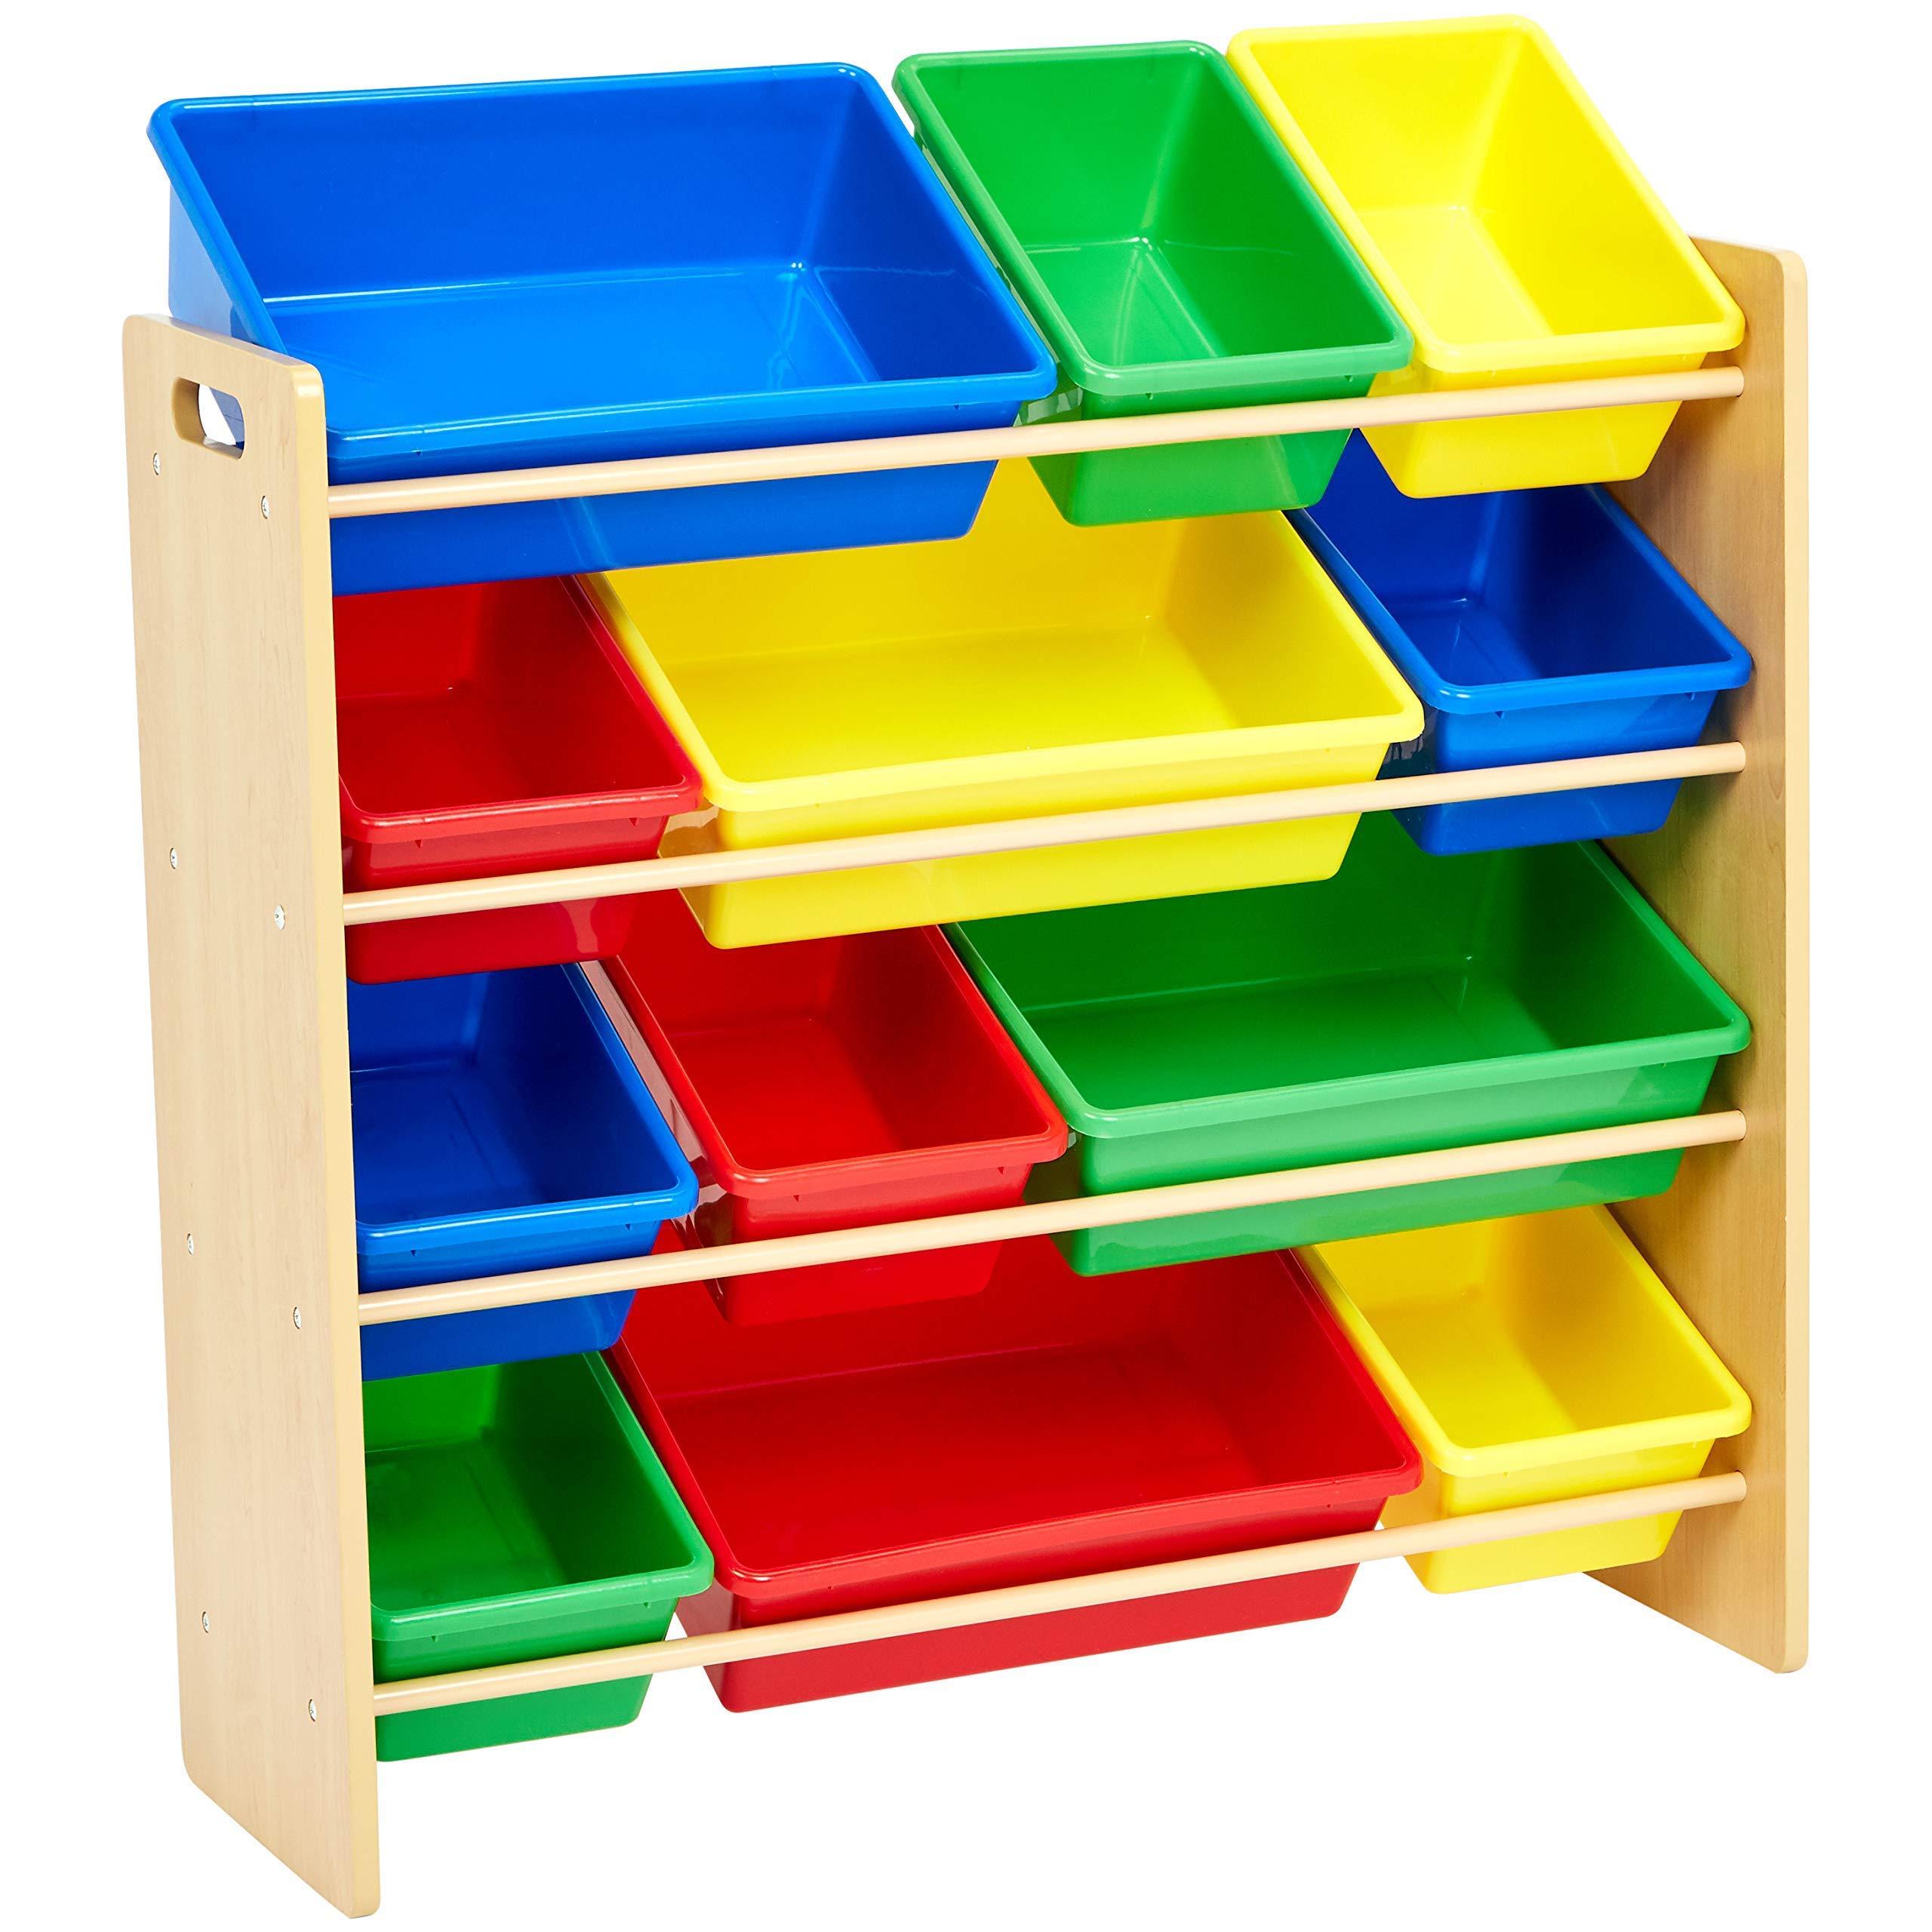 AmazonBasics Kids Toy Storage Organizer Bins - Natural/Primary (Renewed) by AmazonBasics